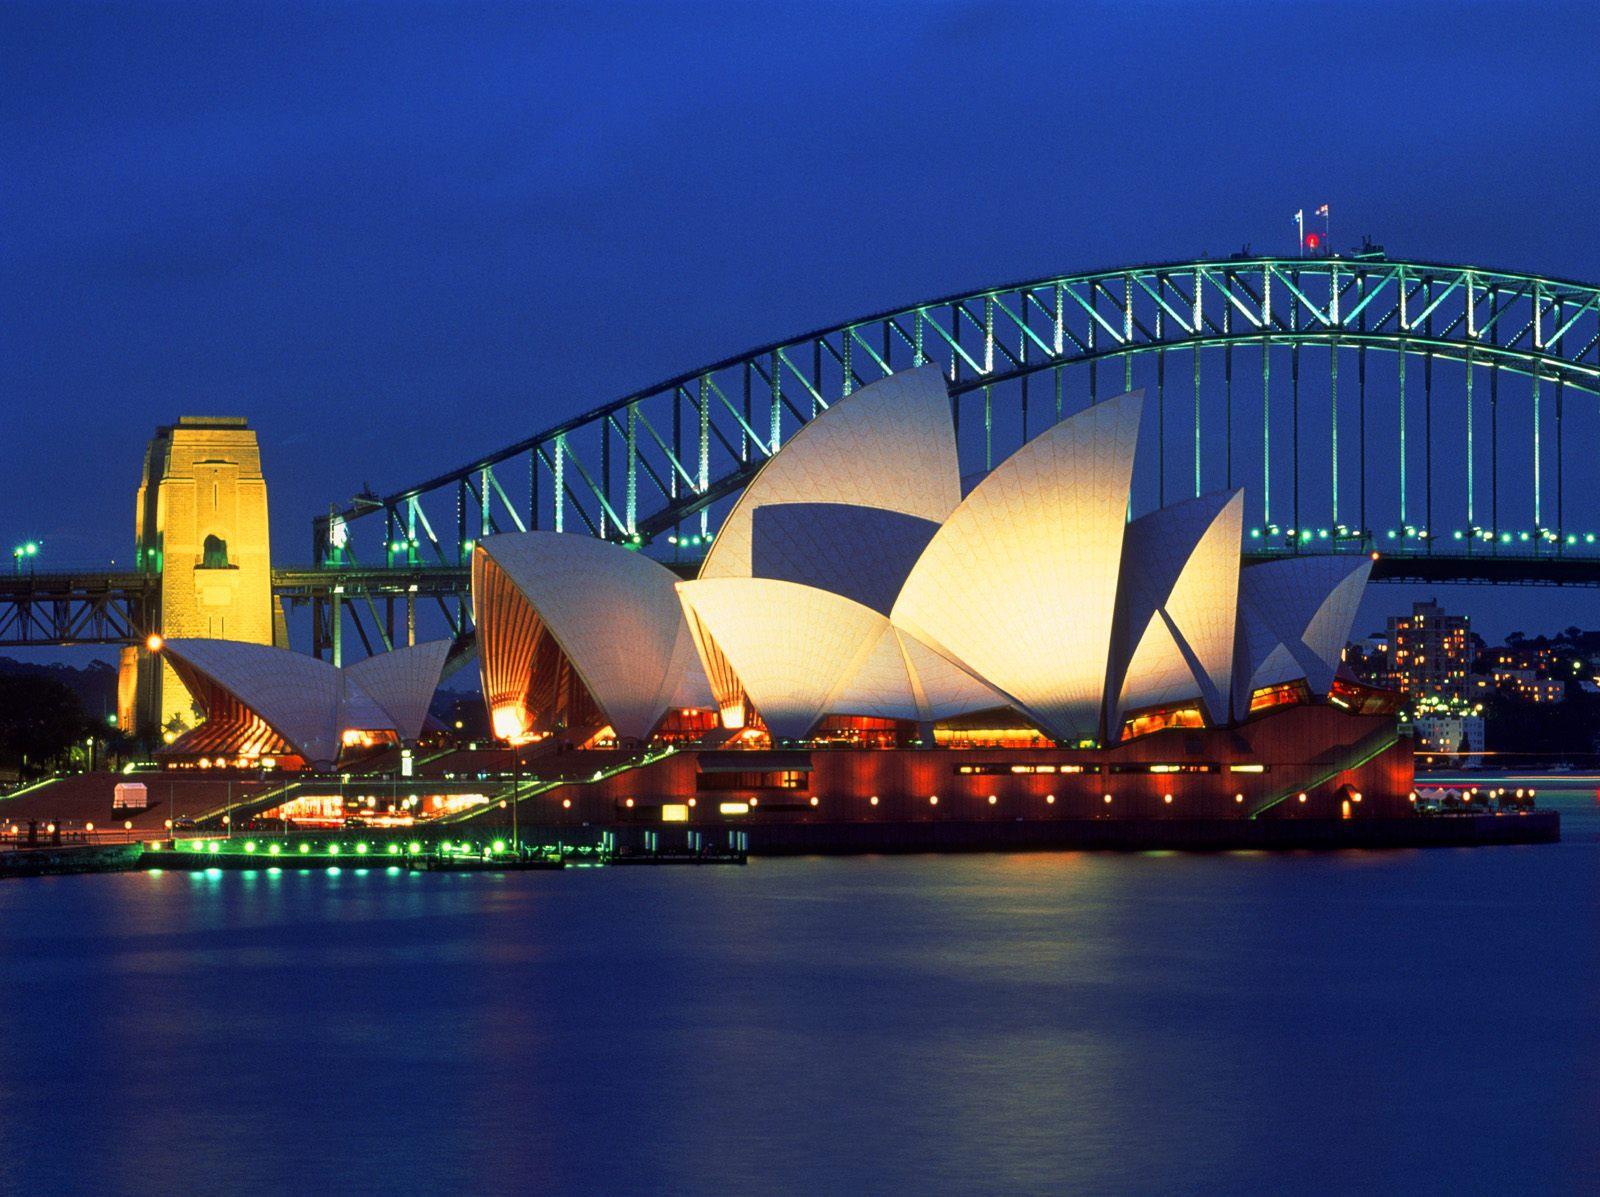 Hotels near Sydney_Australia